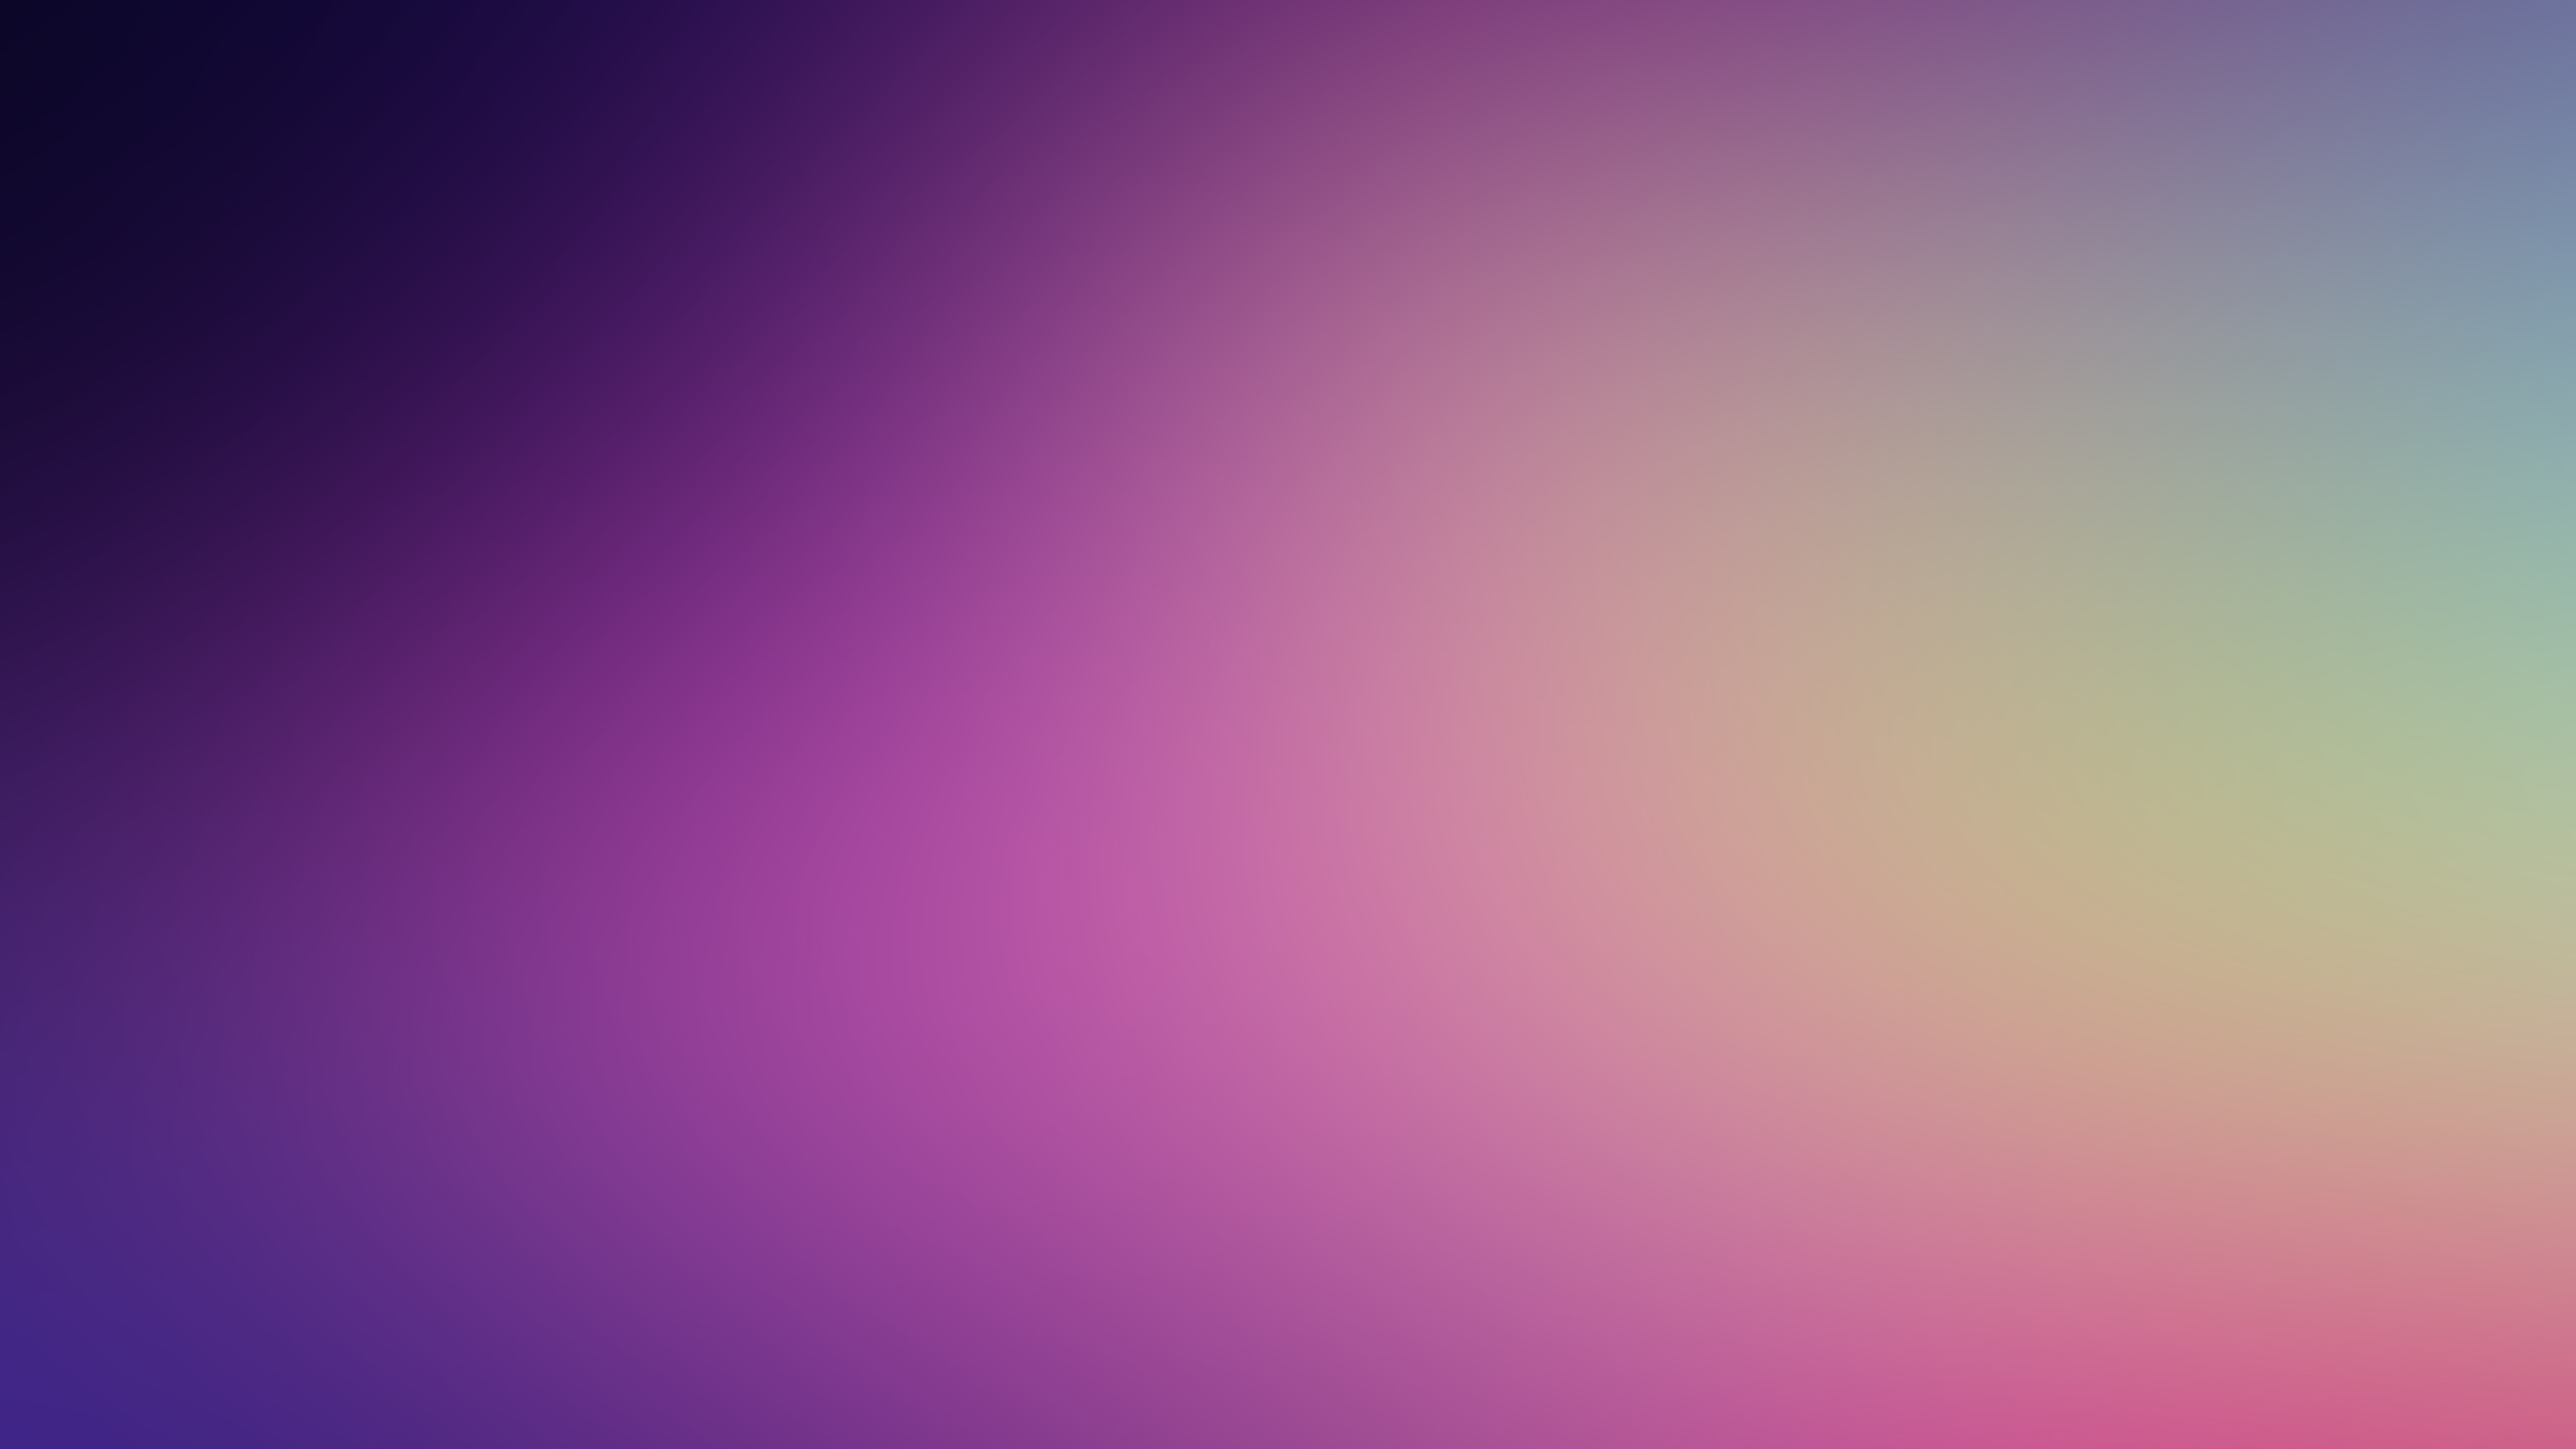 glance 1546277910 - Glance - hd-wallpapers, deviantart wallpapers, blur wallpapers, abstract wallpapers, 4k-wallpapers